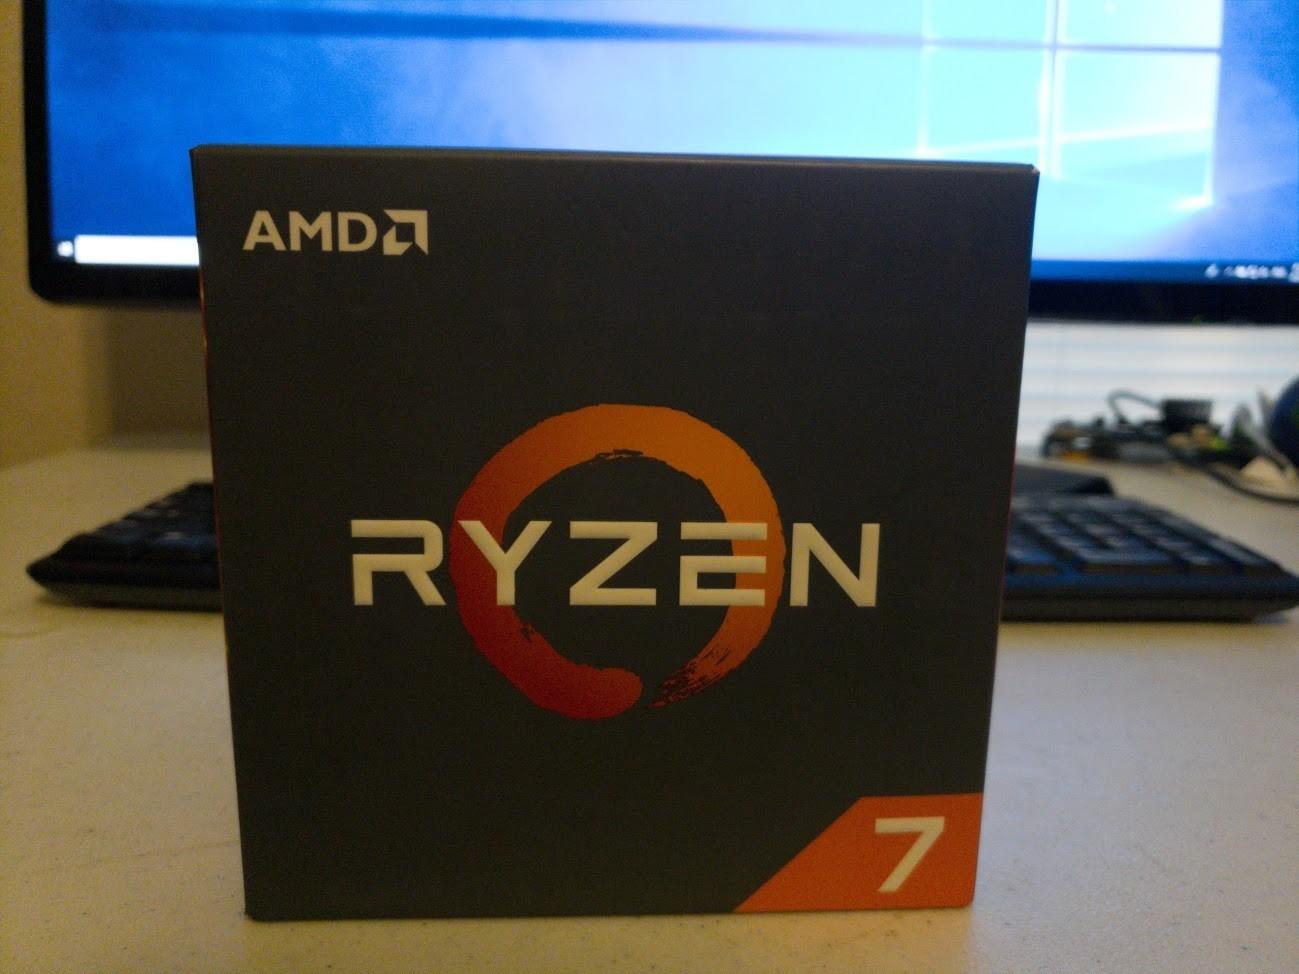 AMD Ryzen 7 2700X - 2